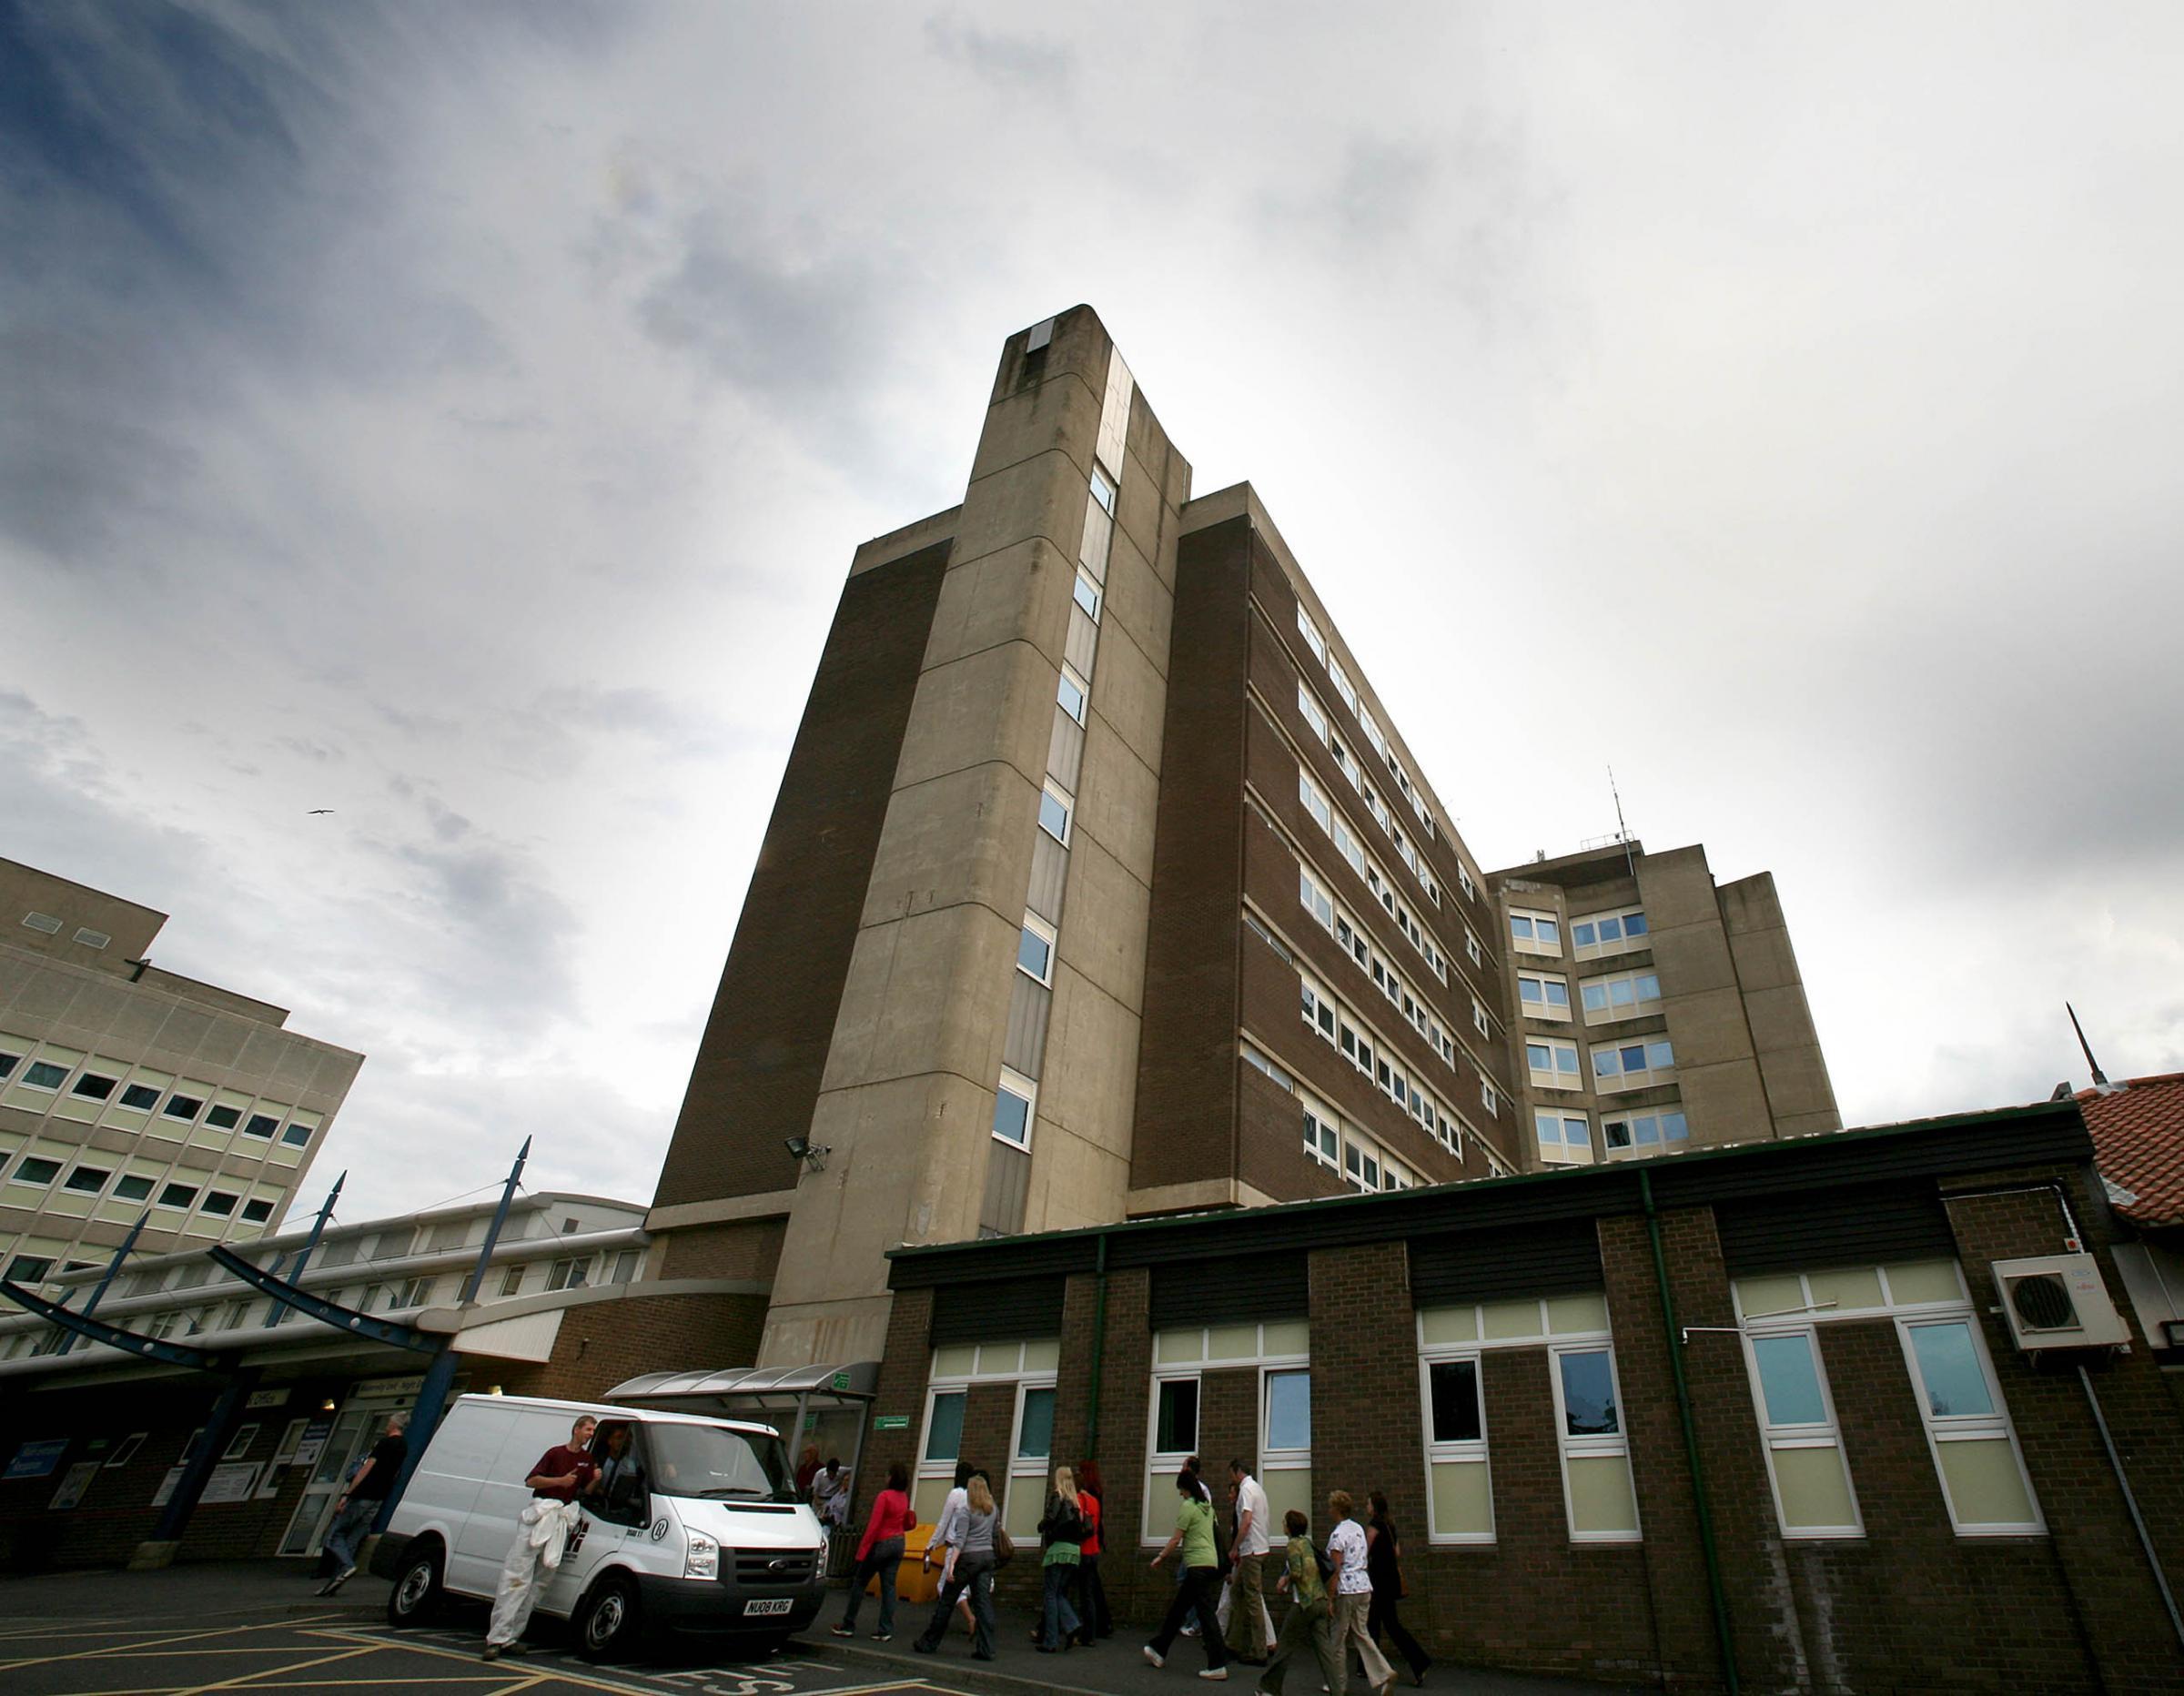 Wards locked at University Hospital of North Tees in Stockton